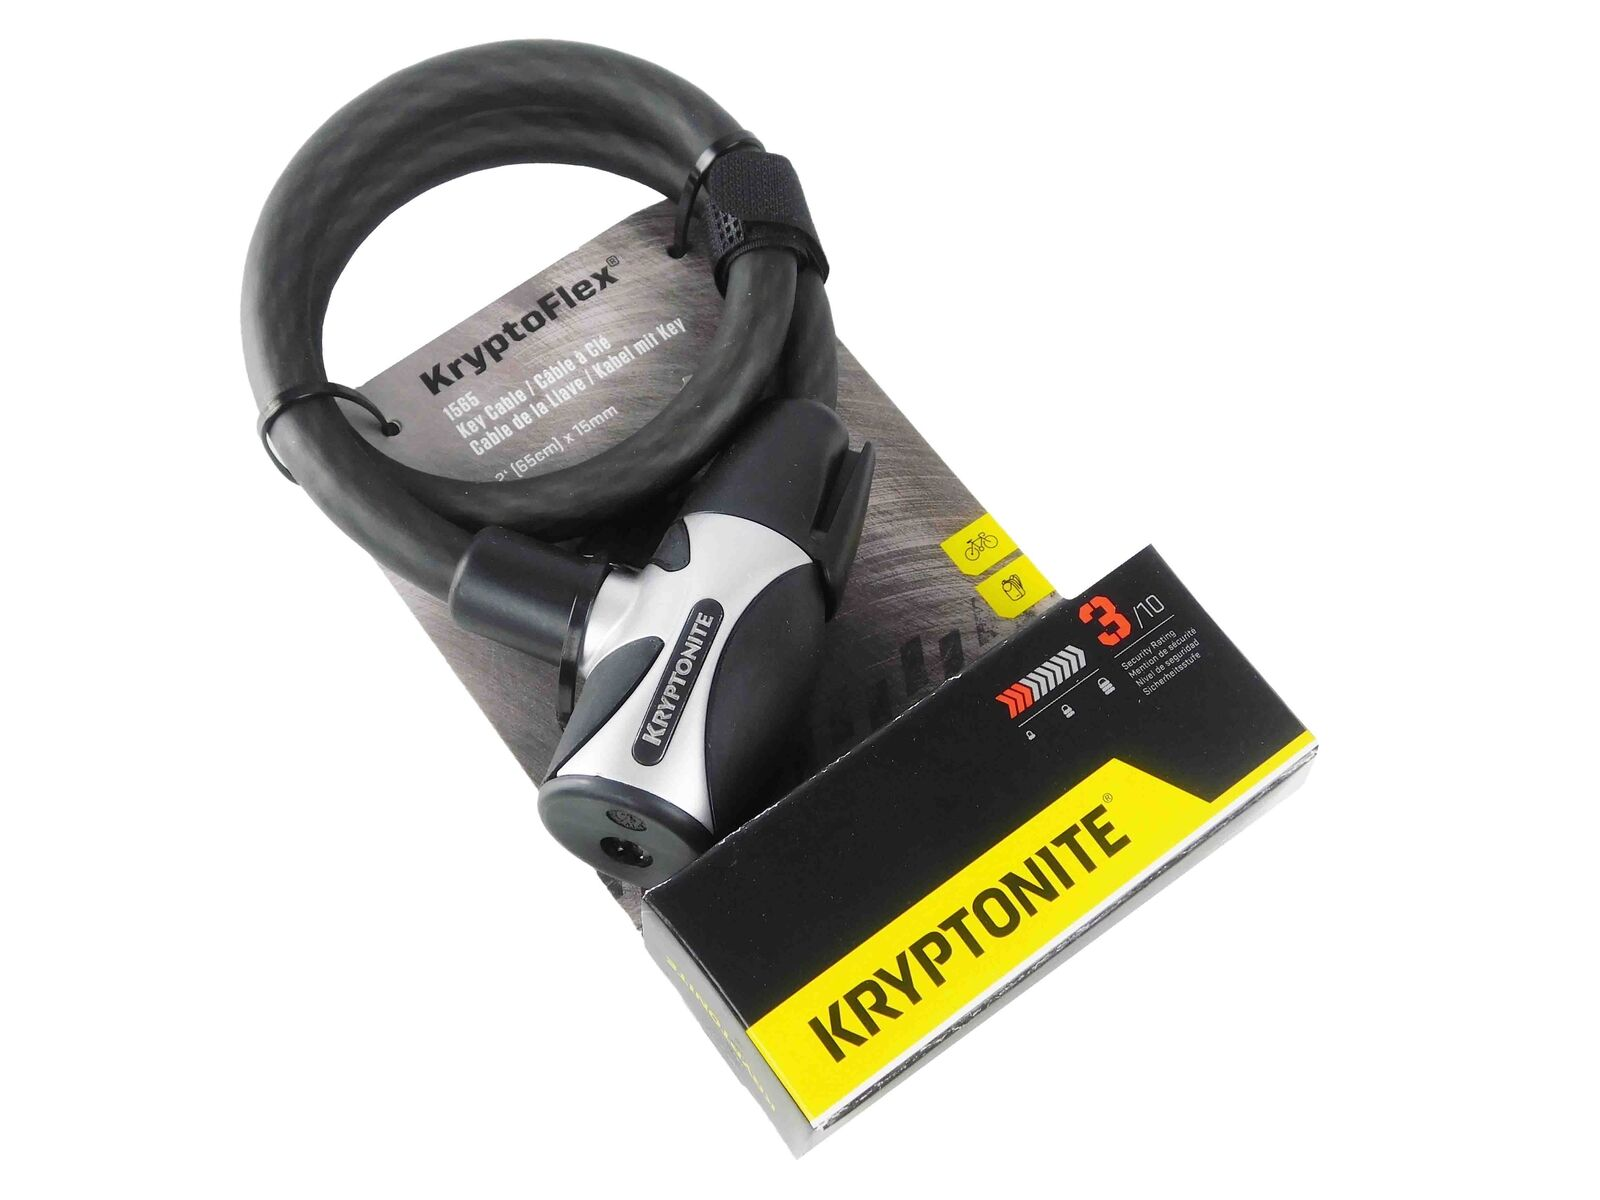 KRYPTONITE KRYPTOFLEX 1565 COMBO COMBINATION BIKE BICYCLE CABLE LOCK 15MM X 2 FT